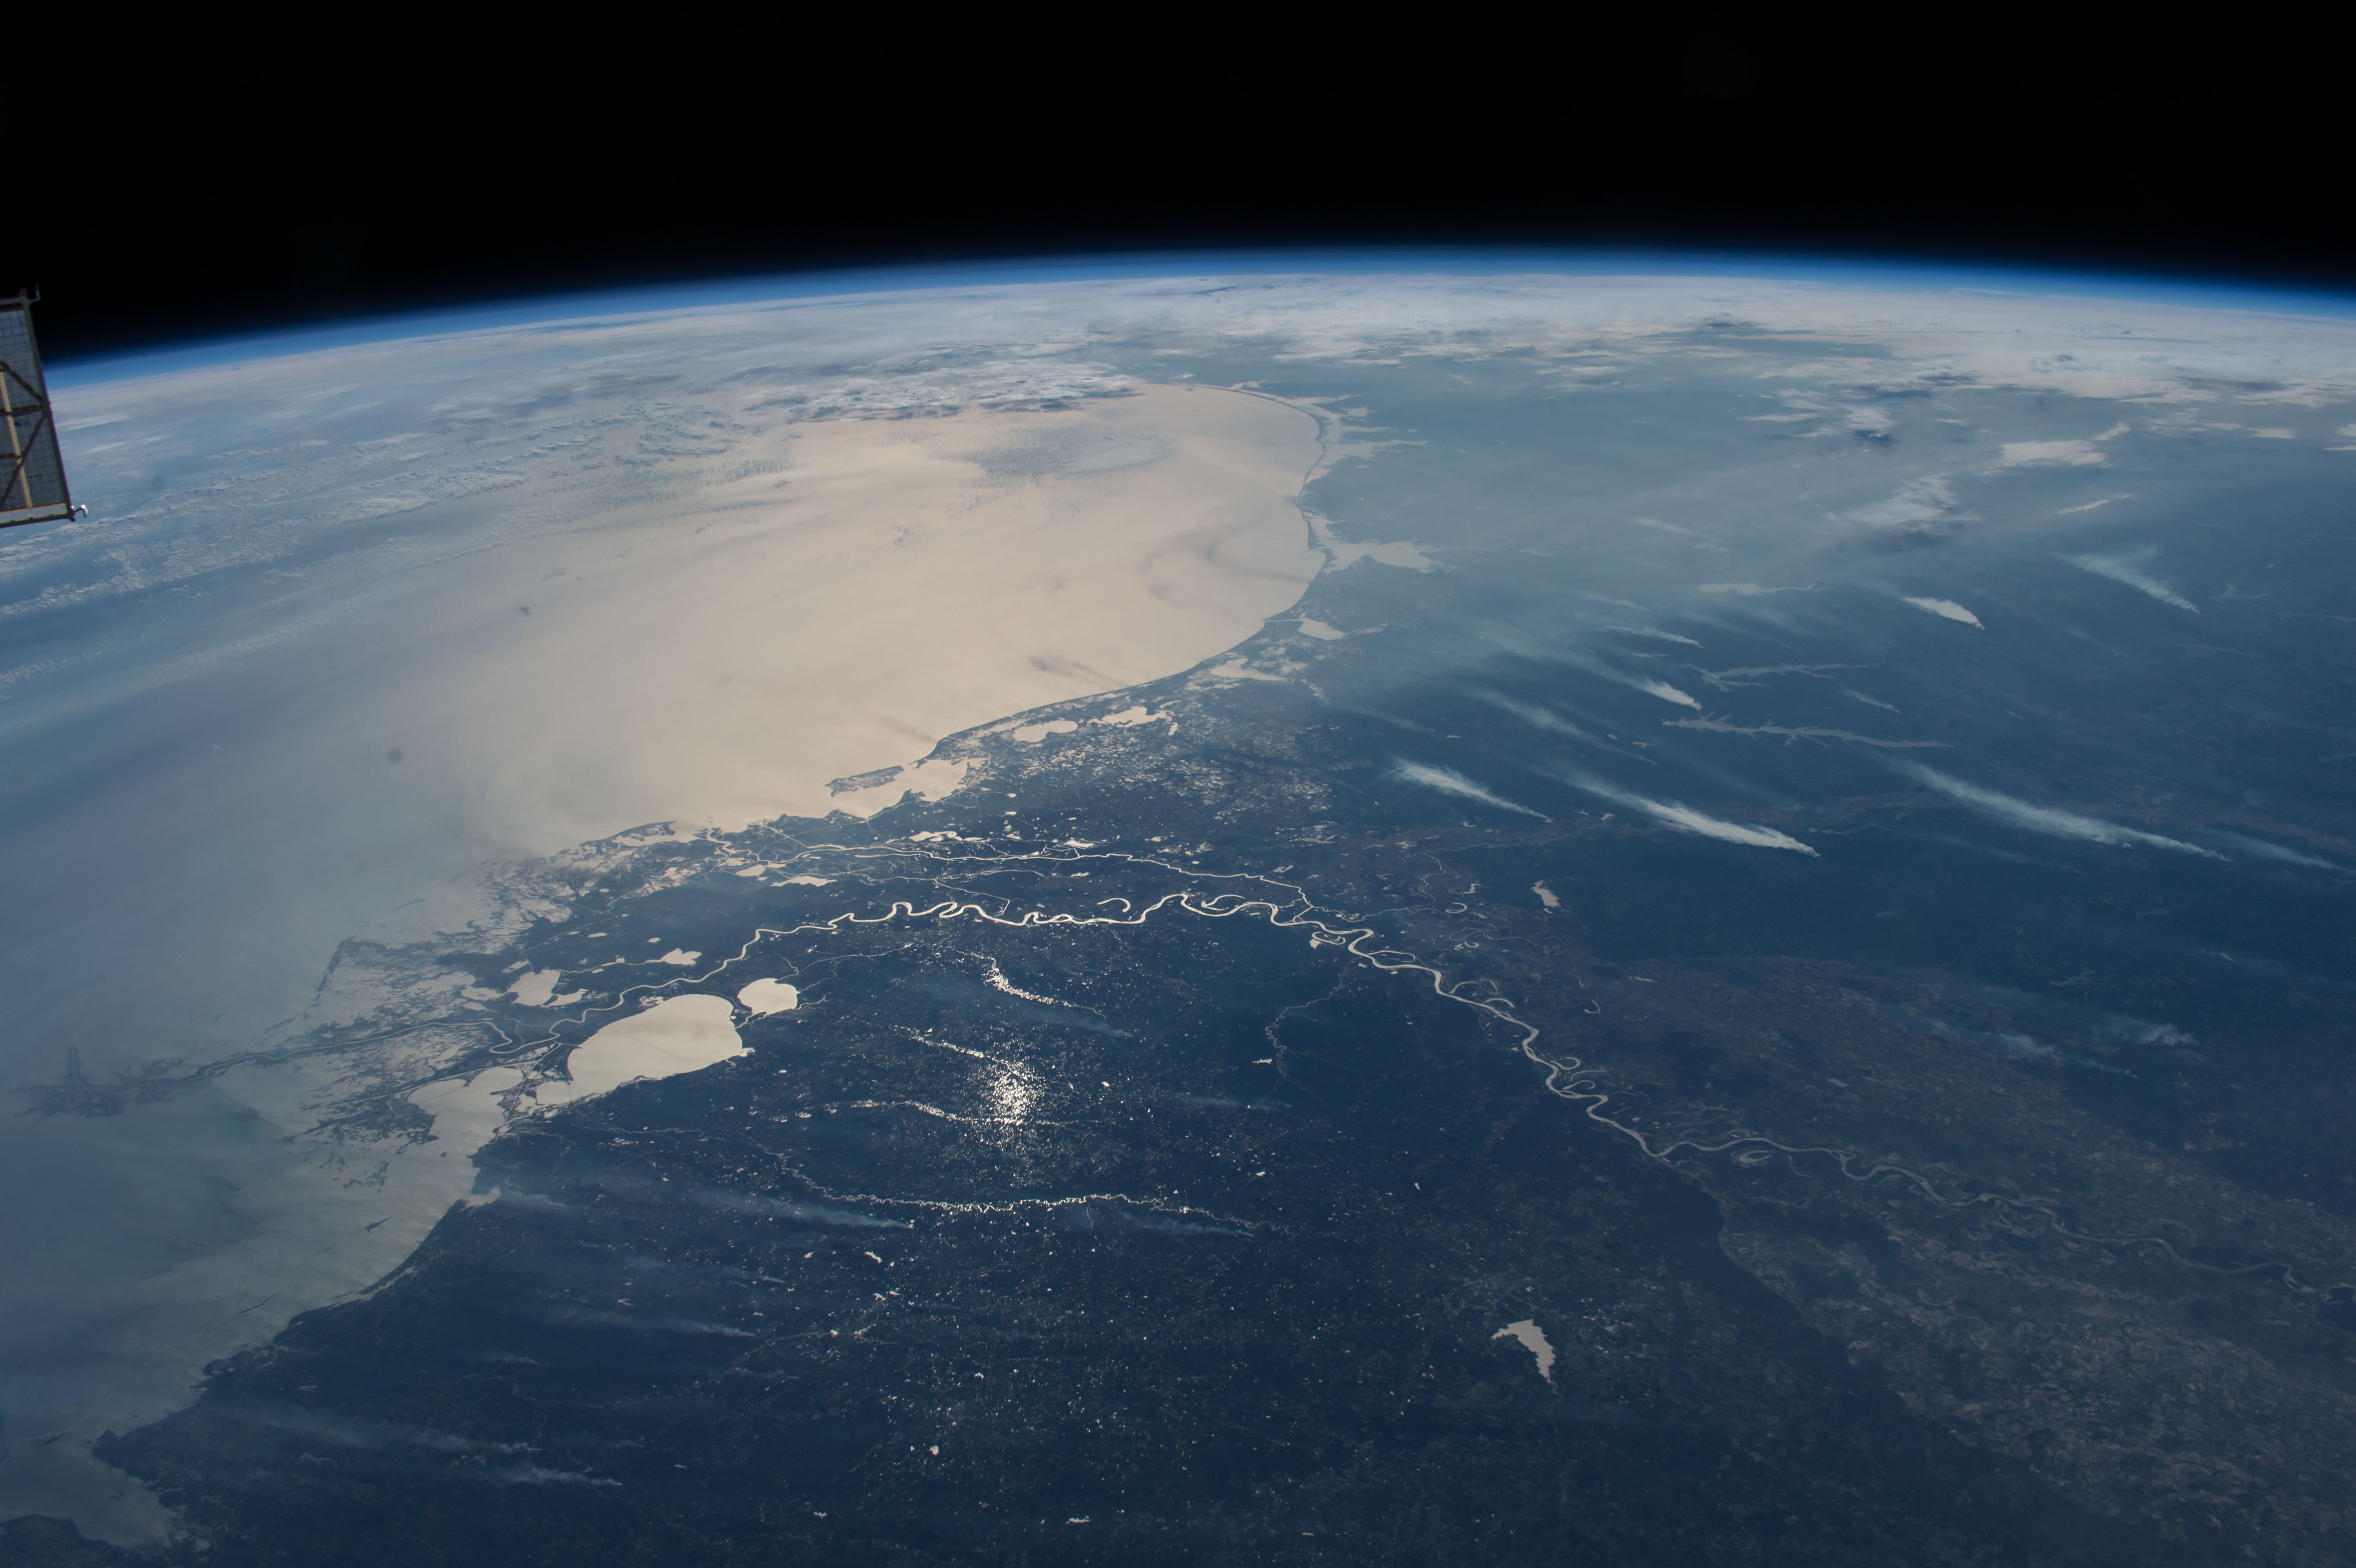 usa nasa astronauts - photo #34